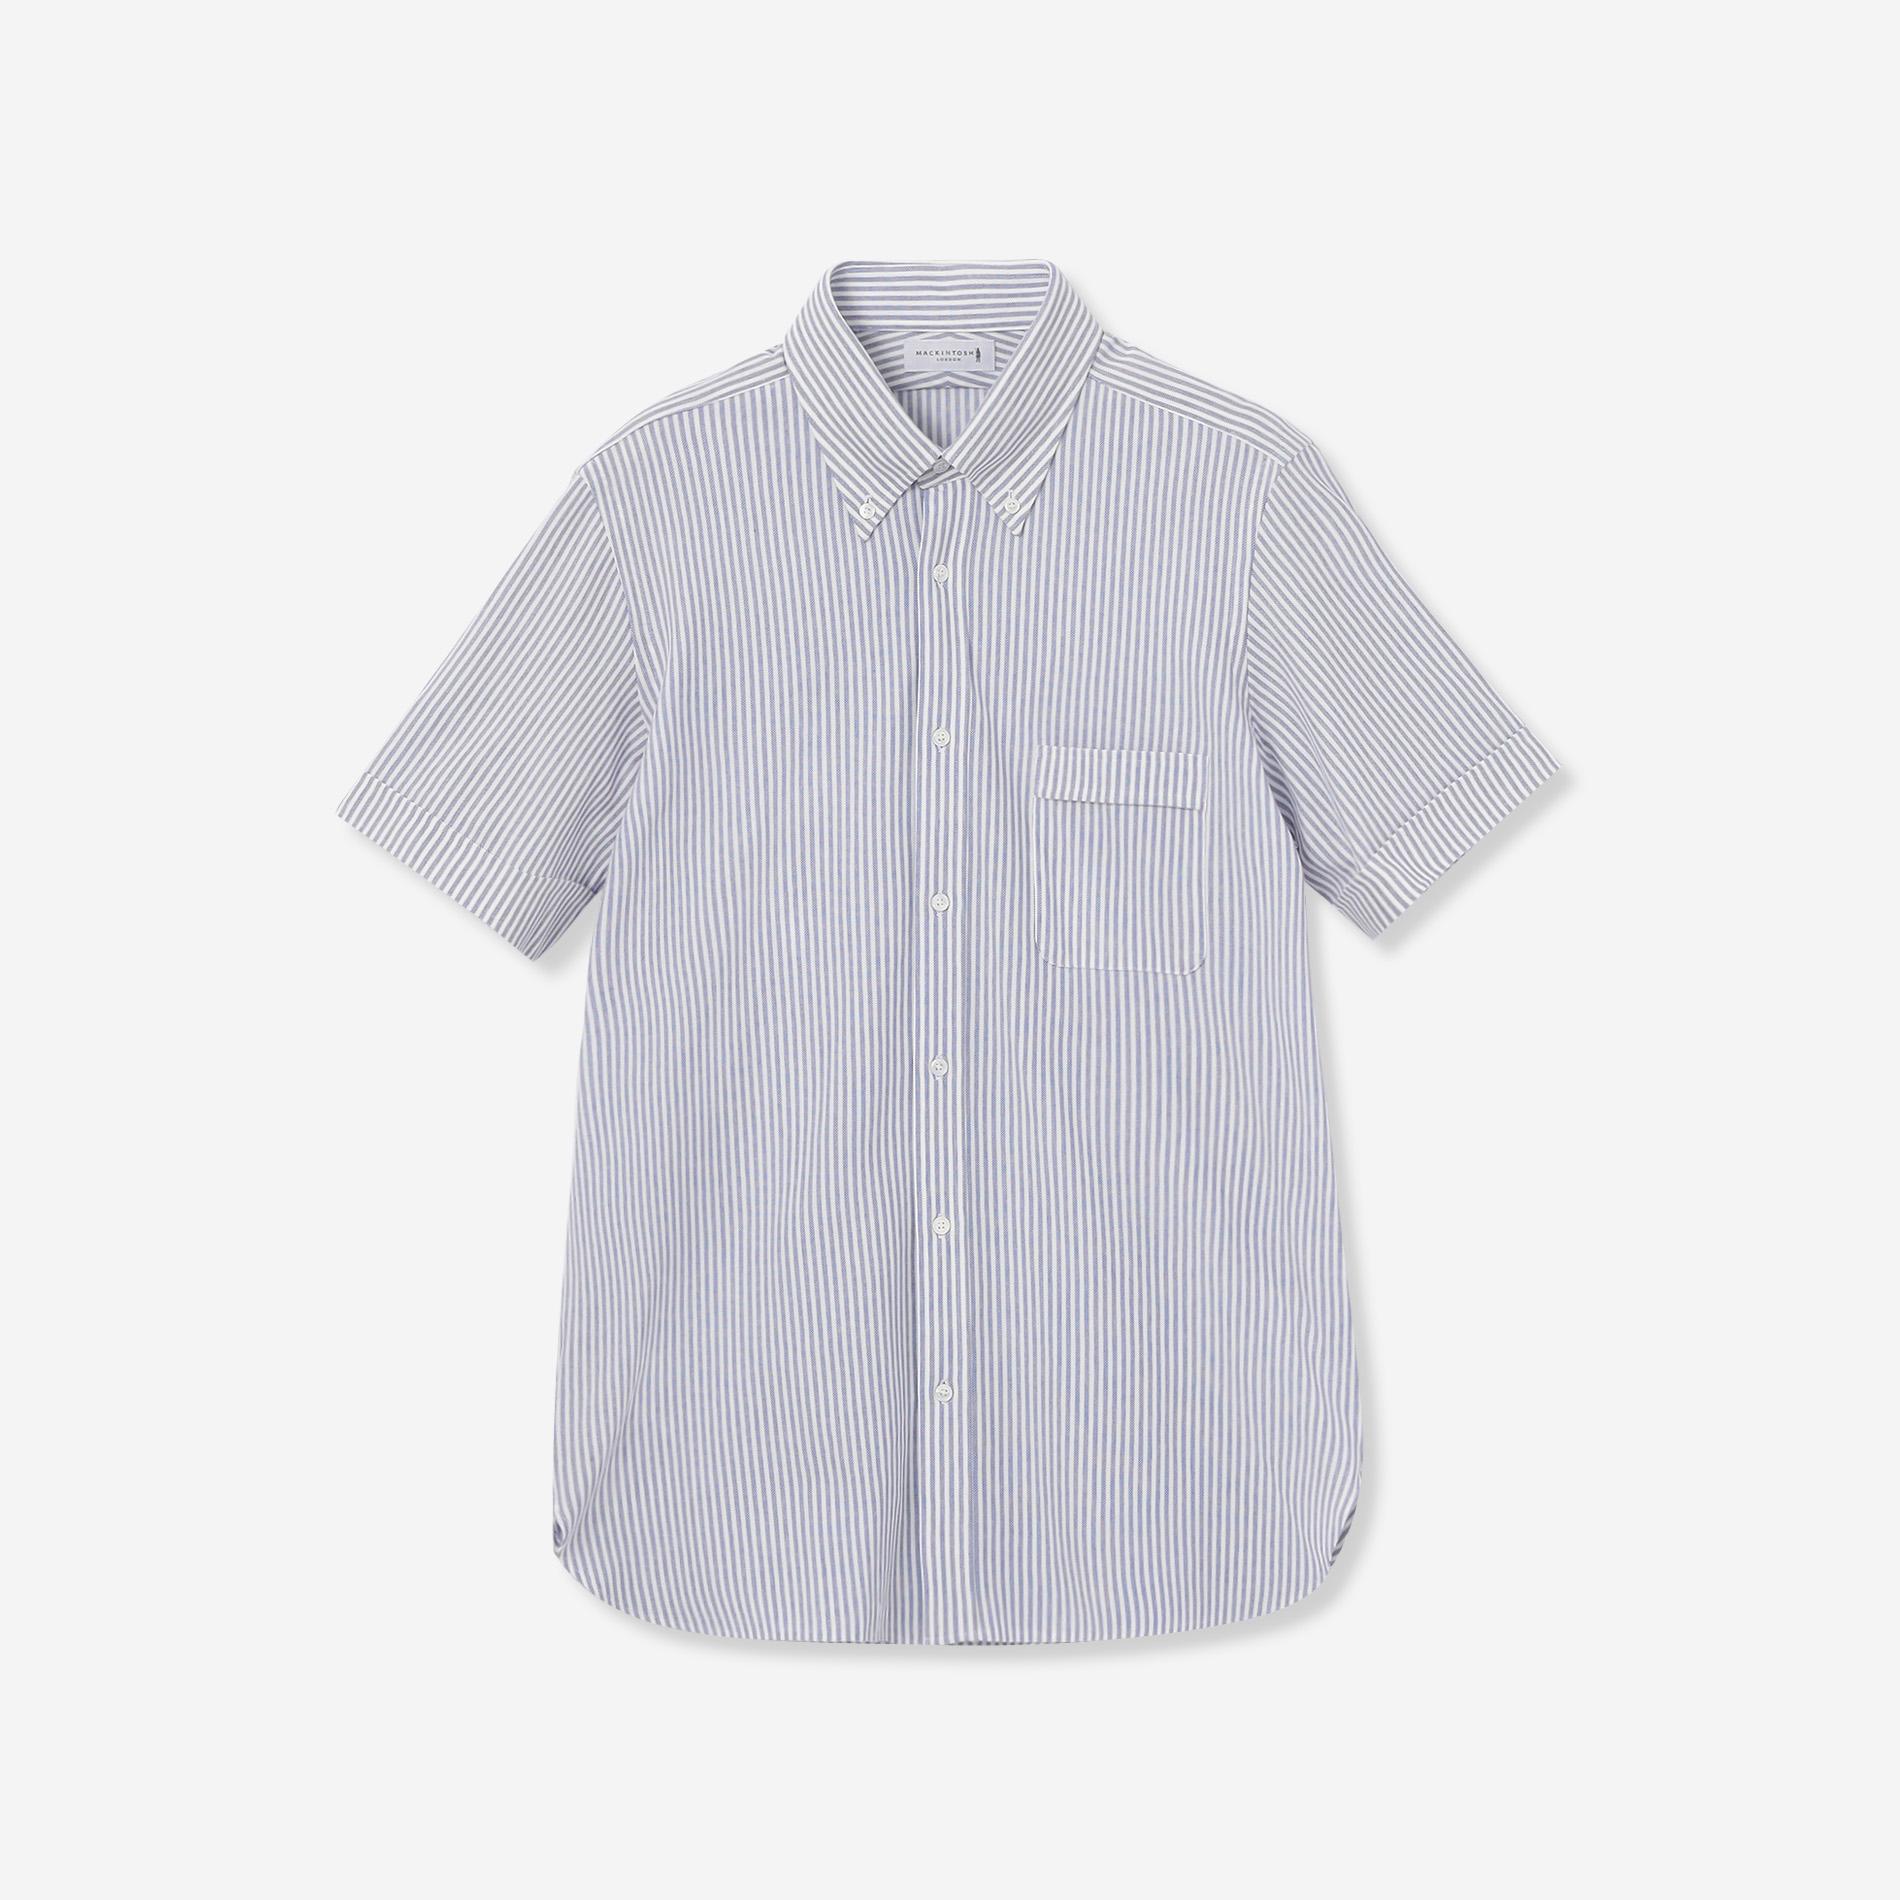 【FLEX JERSEY】ドライ鹿の子ロンストジャージ半袖ドレスシャツ